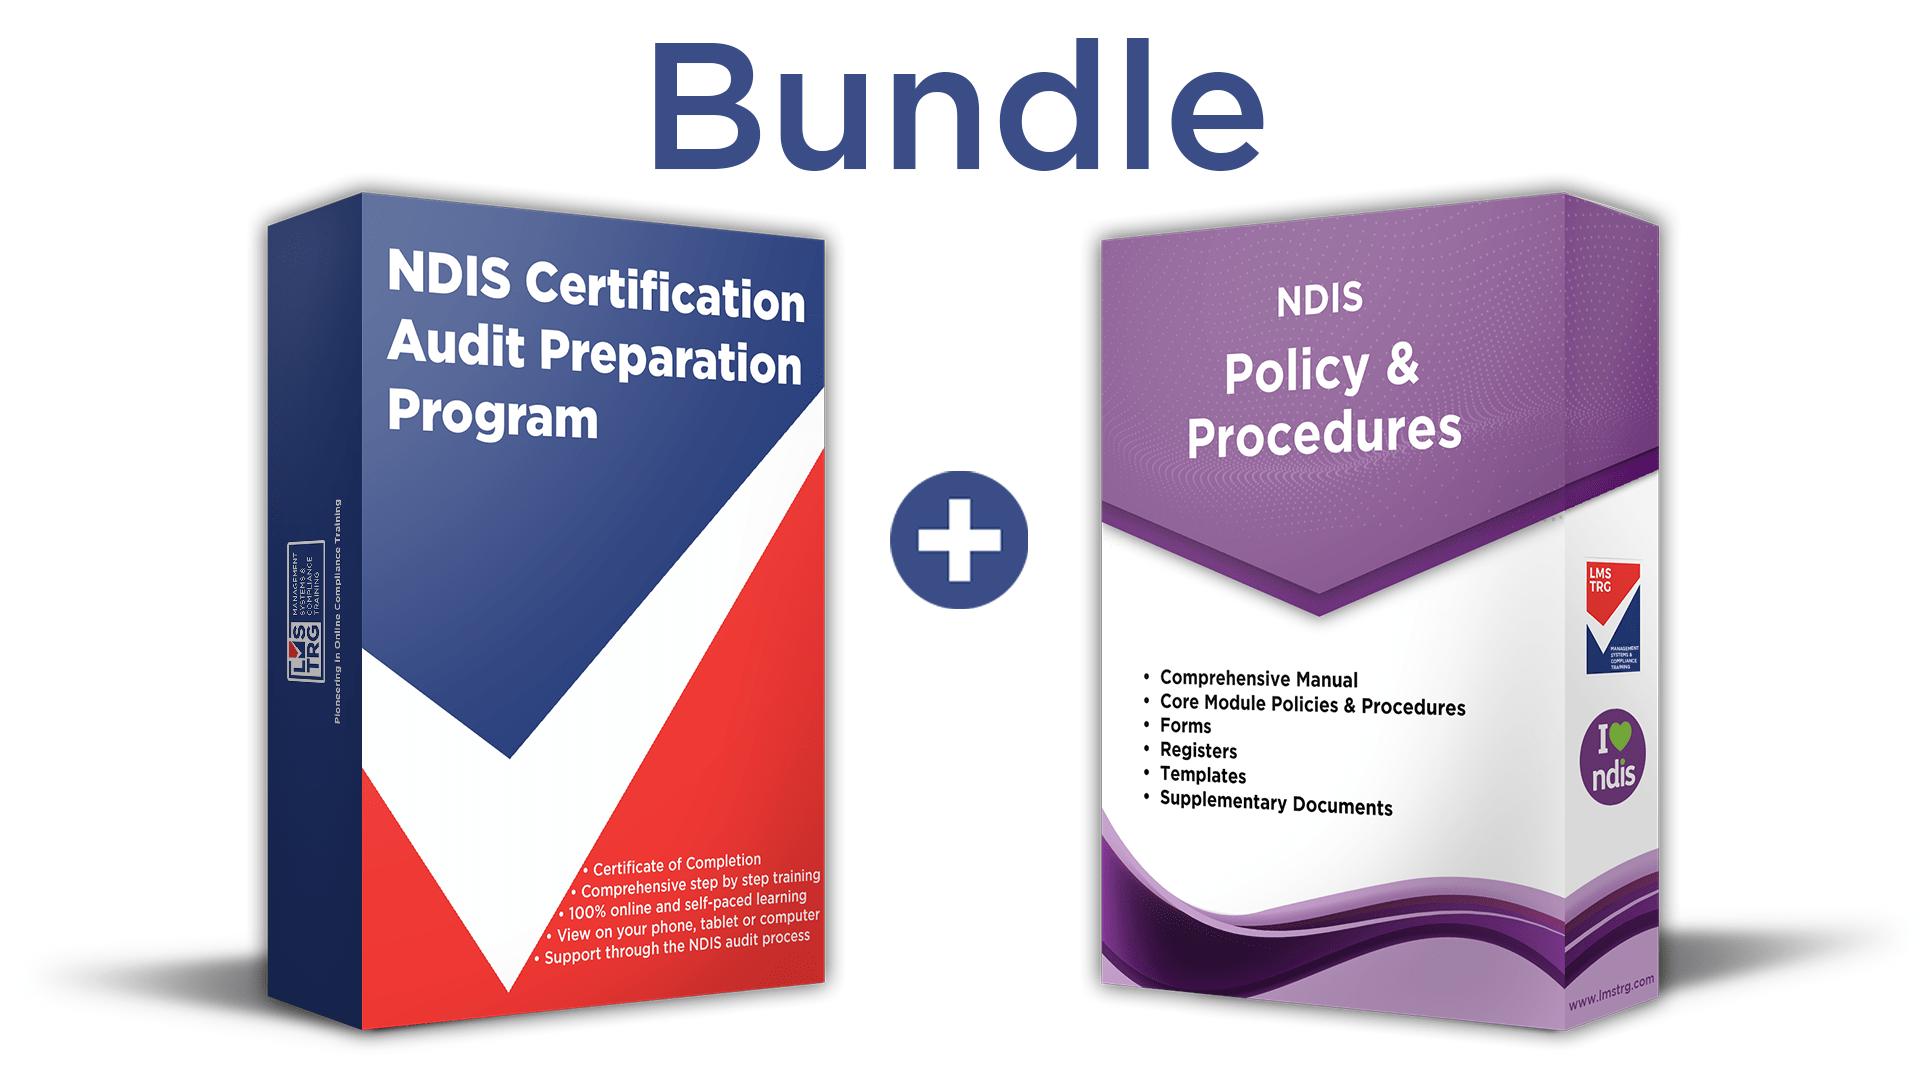 NDIS Core Module Bundle NDIS Registration Training and Template